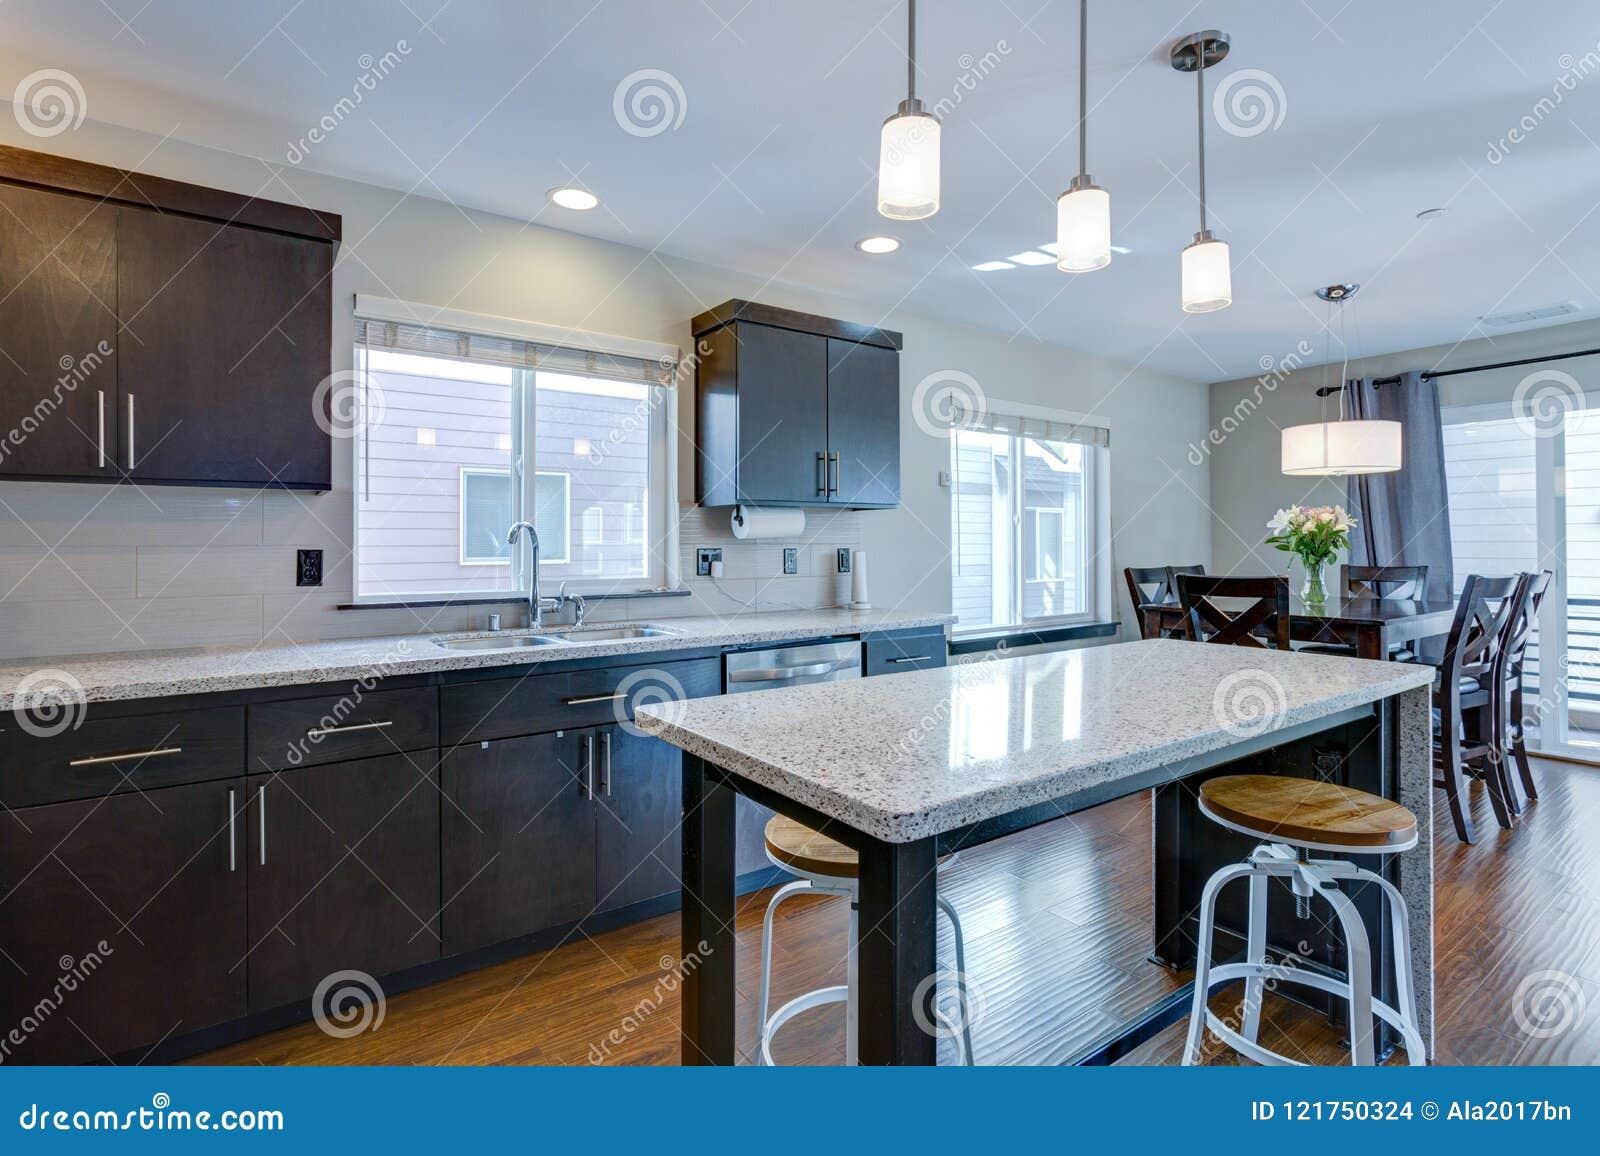 Spacious Kitchen With Open Floor Plan Stock Photo - Image of decor ...